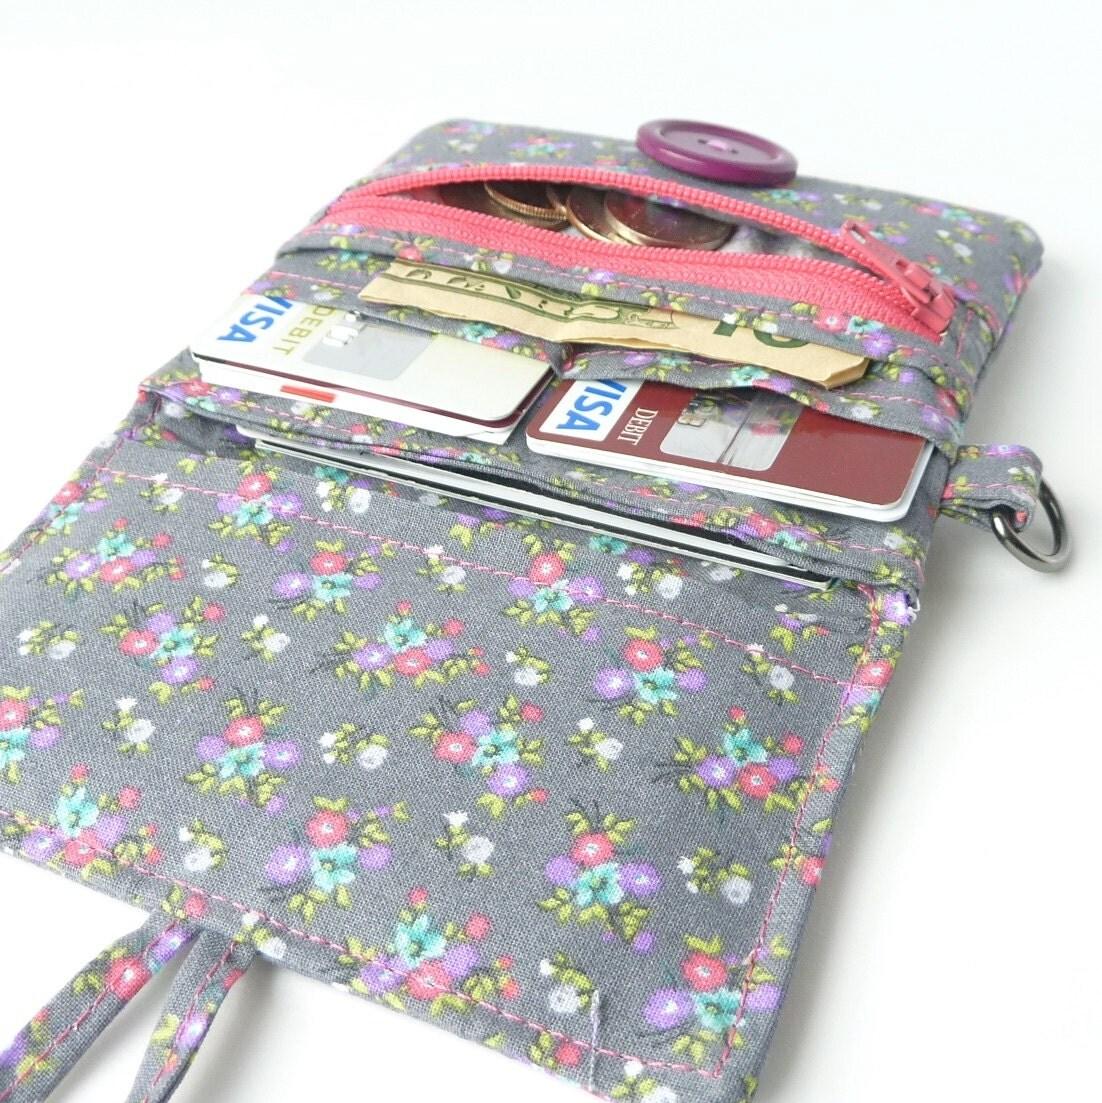 fabric coin purse card organizer. cute grey floral cloth